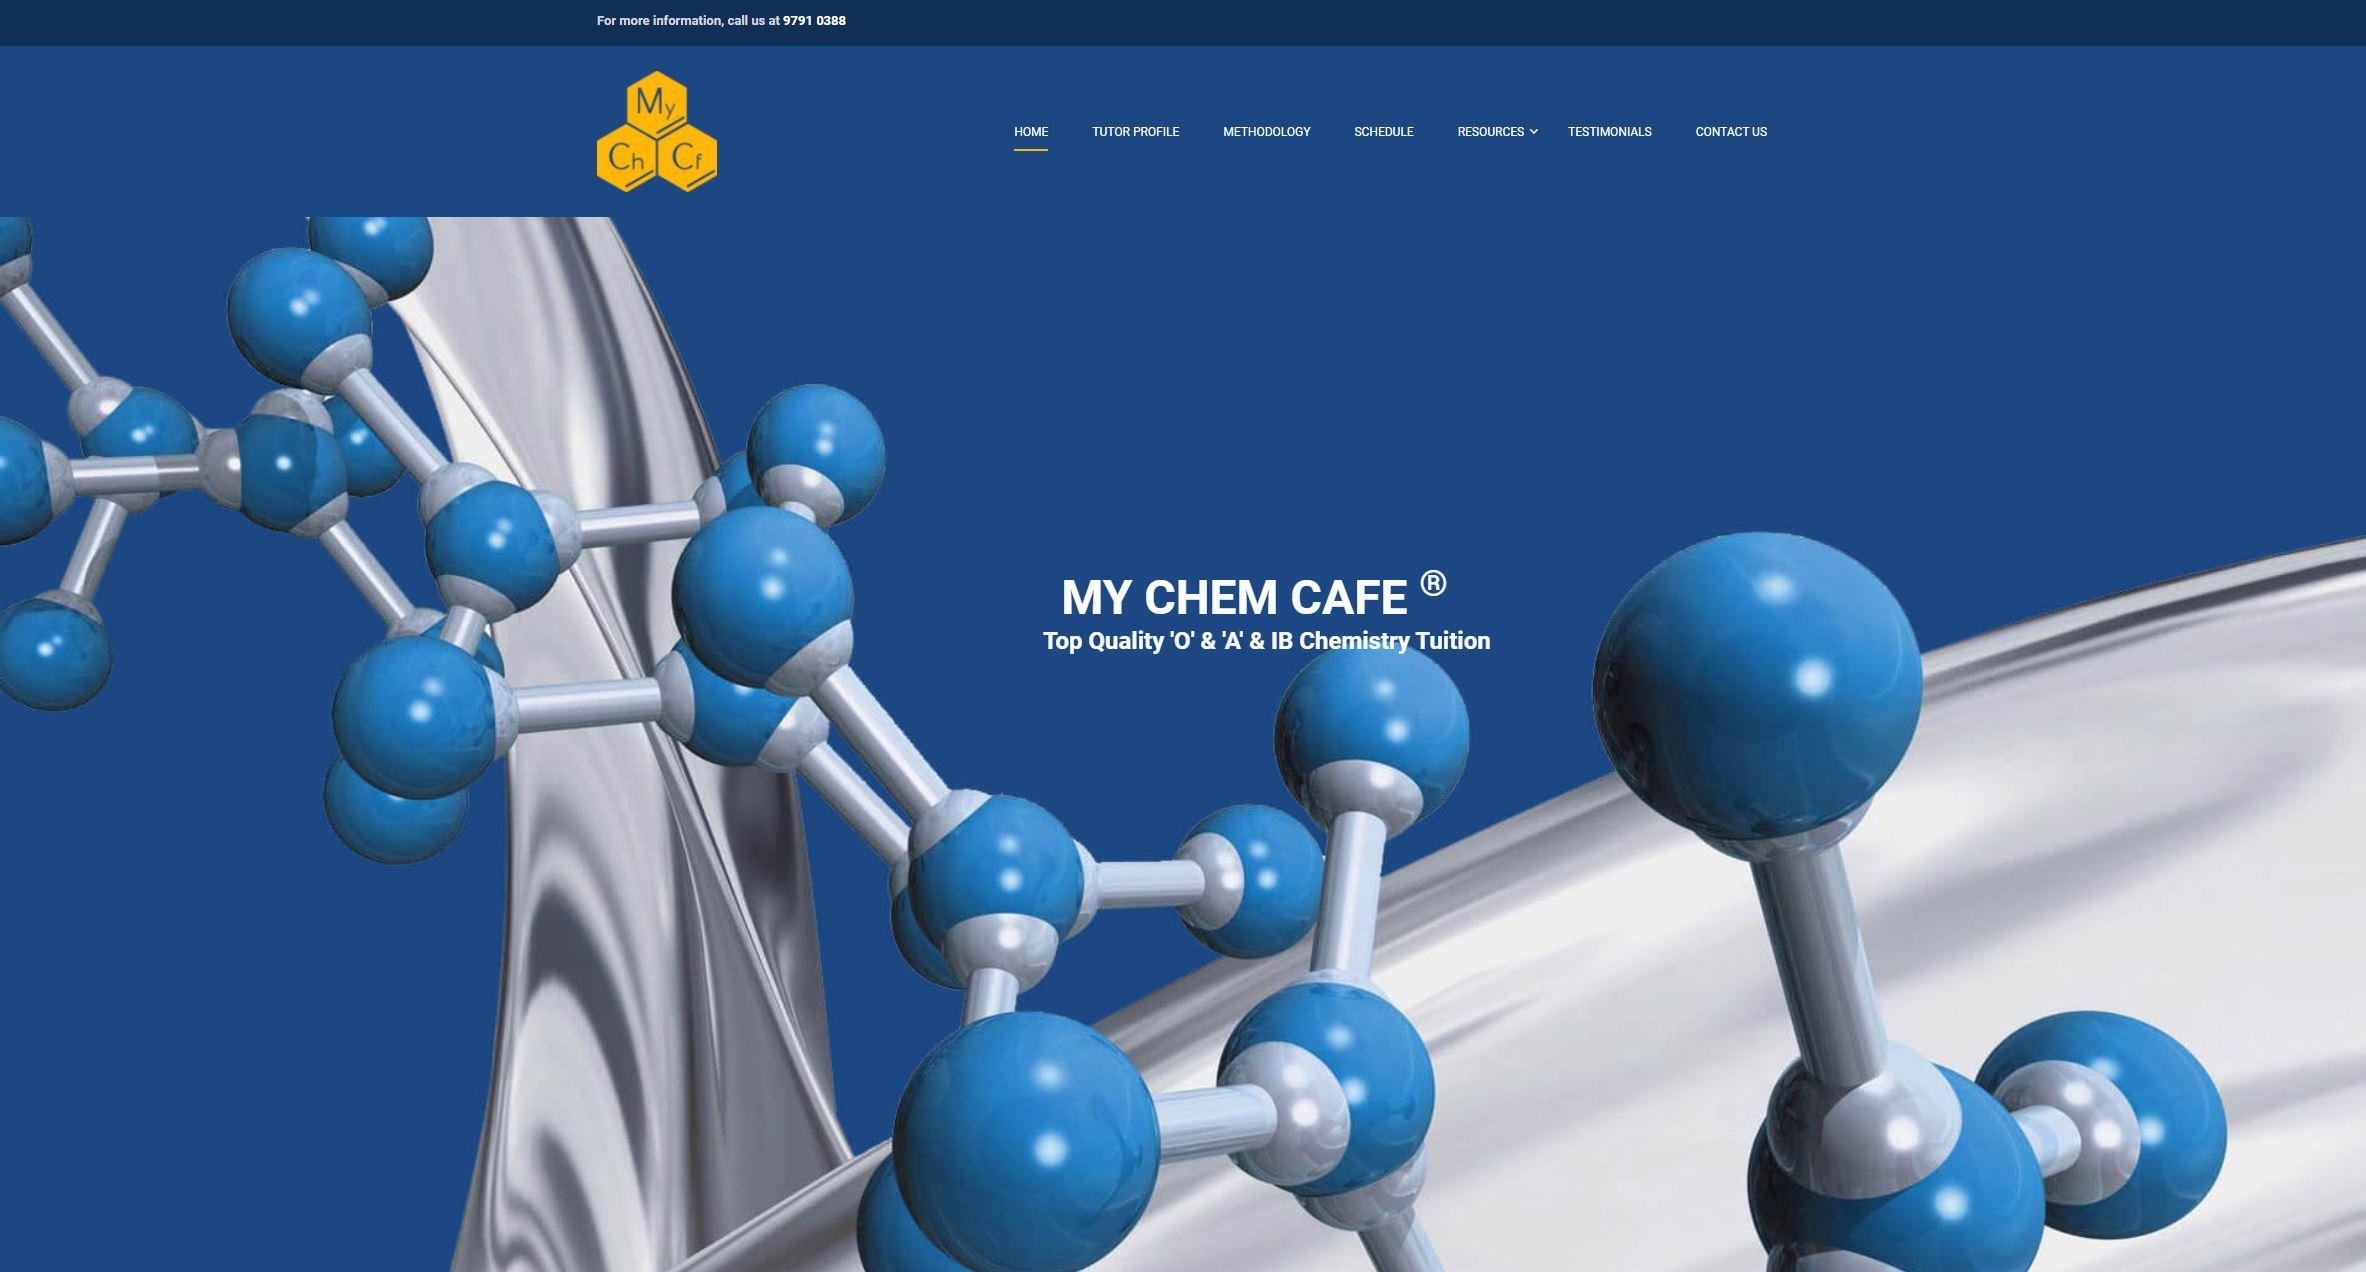 My Chem Cafe IB Tuition